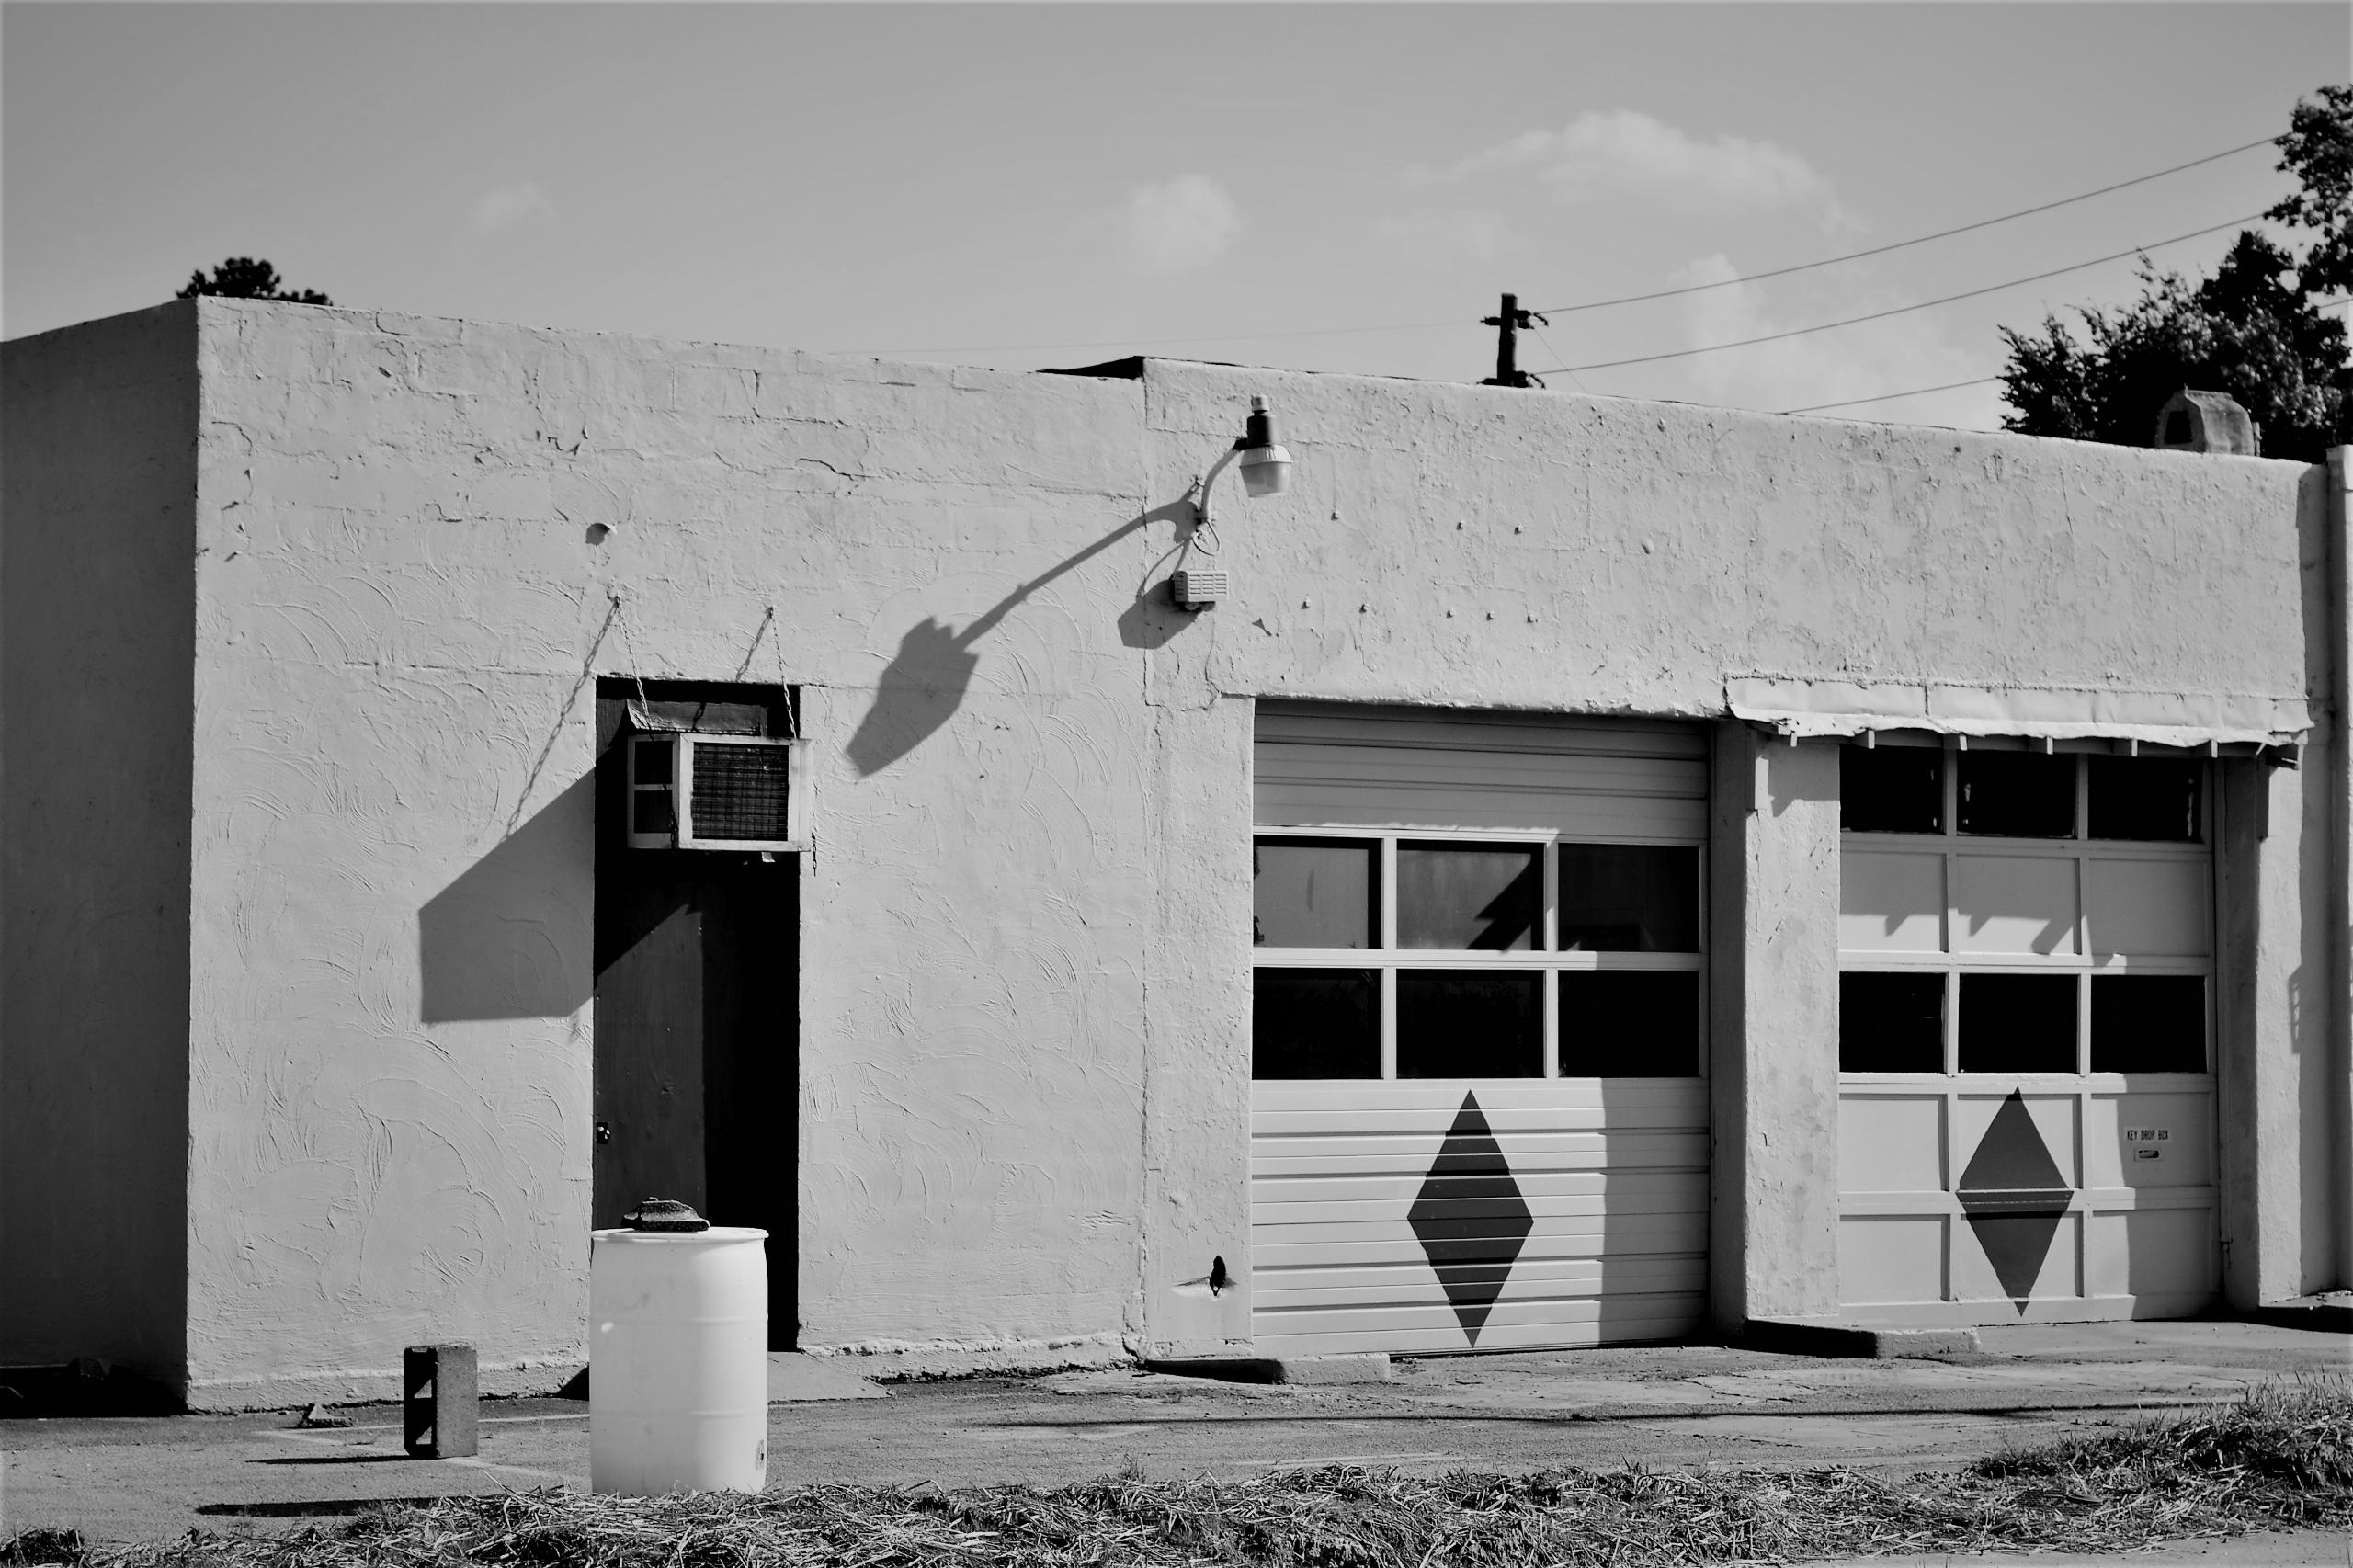 Abandonado - Atlanta, abandoned - drewsview74 | ello